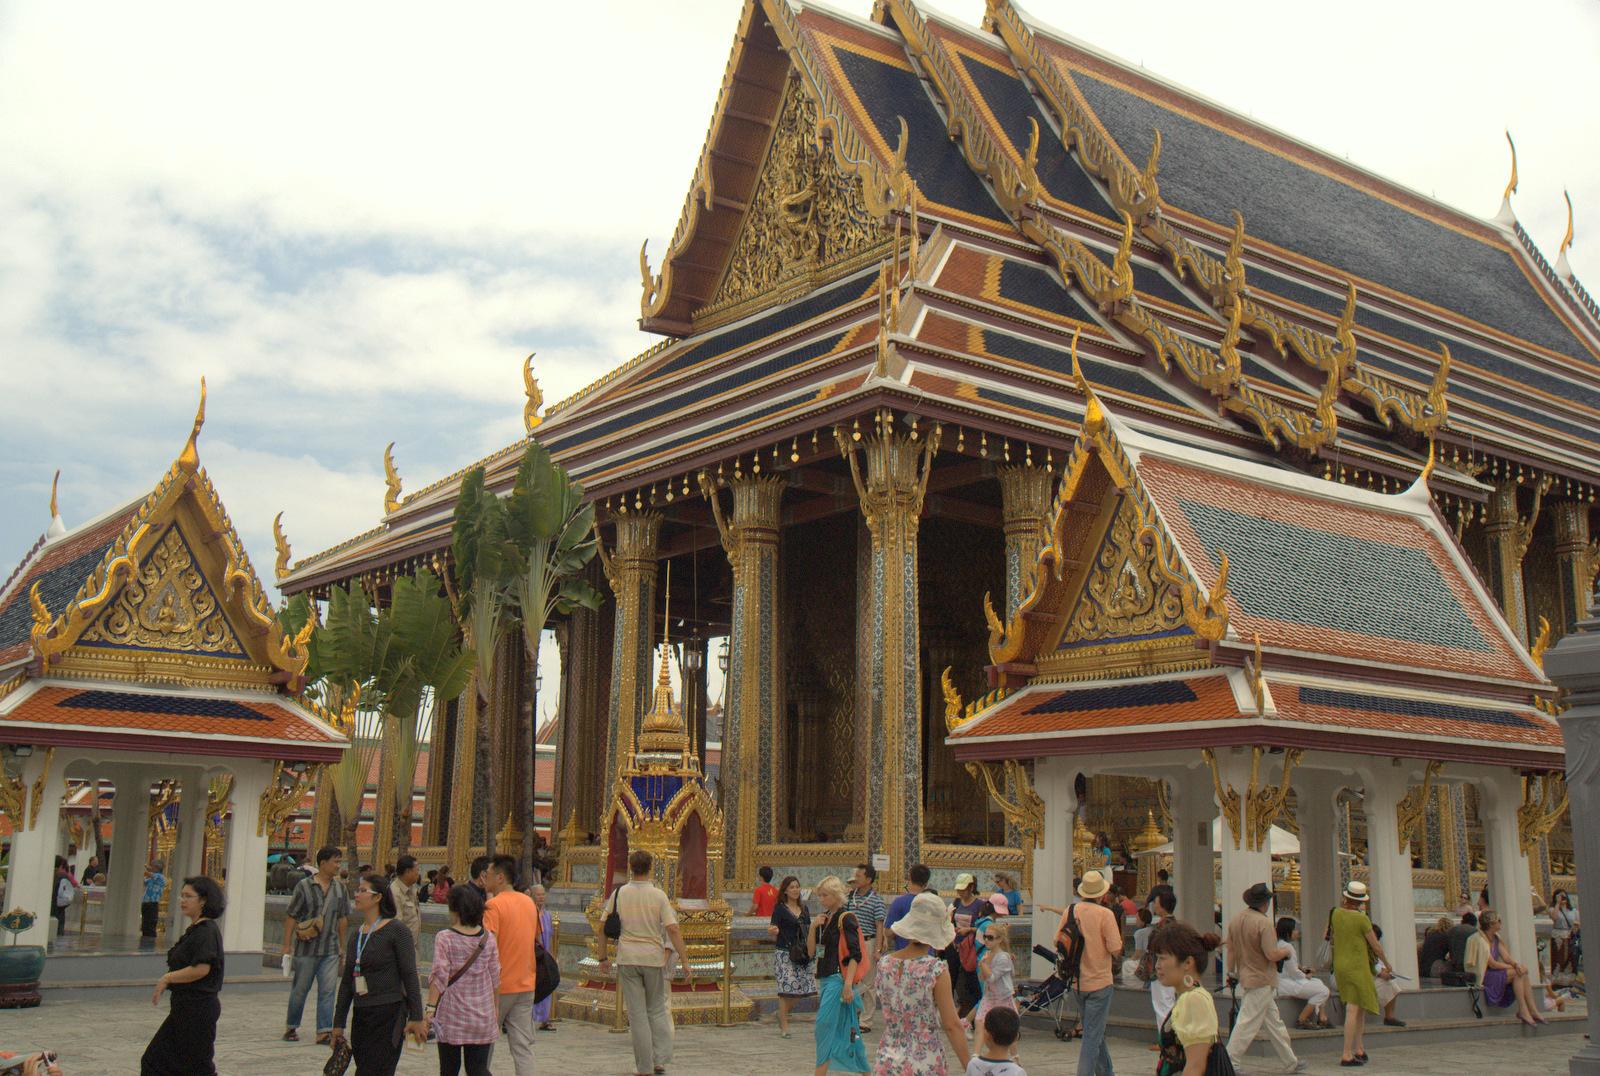 Bangkok (ostatni spacer autobusem i rzeką) 18